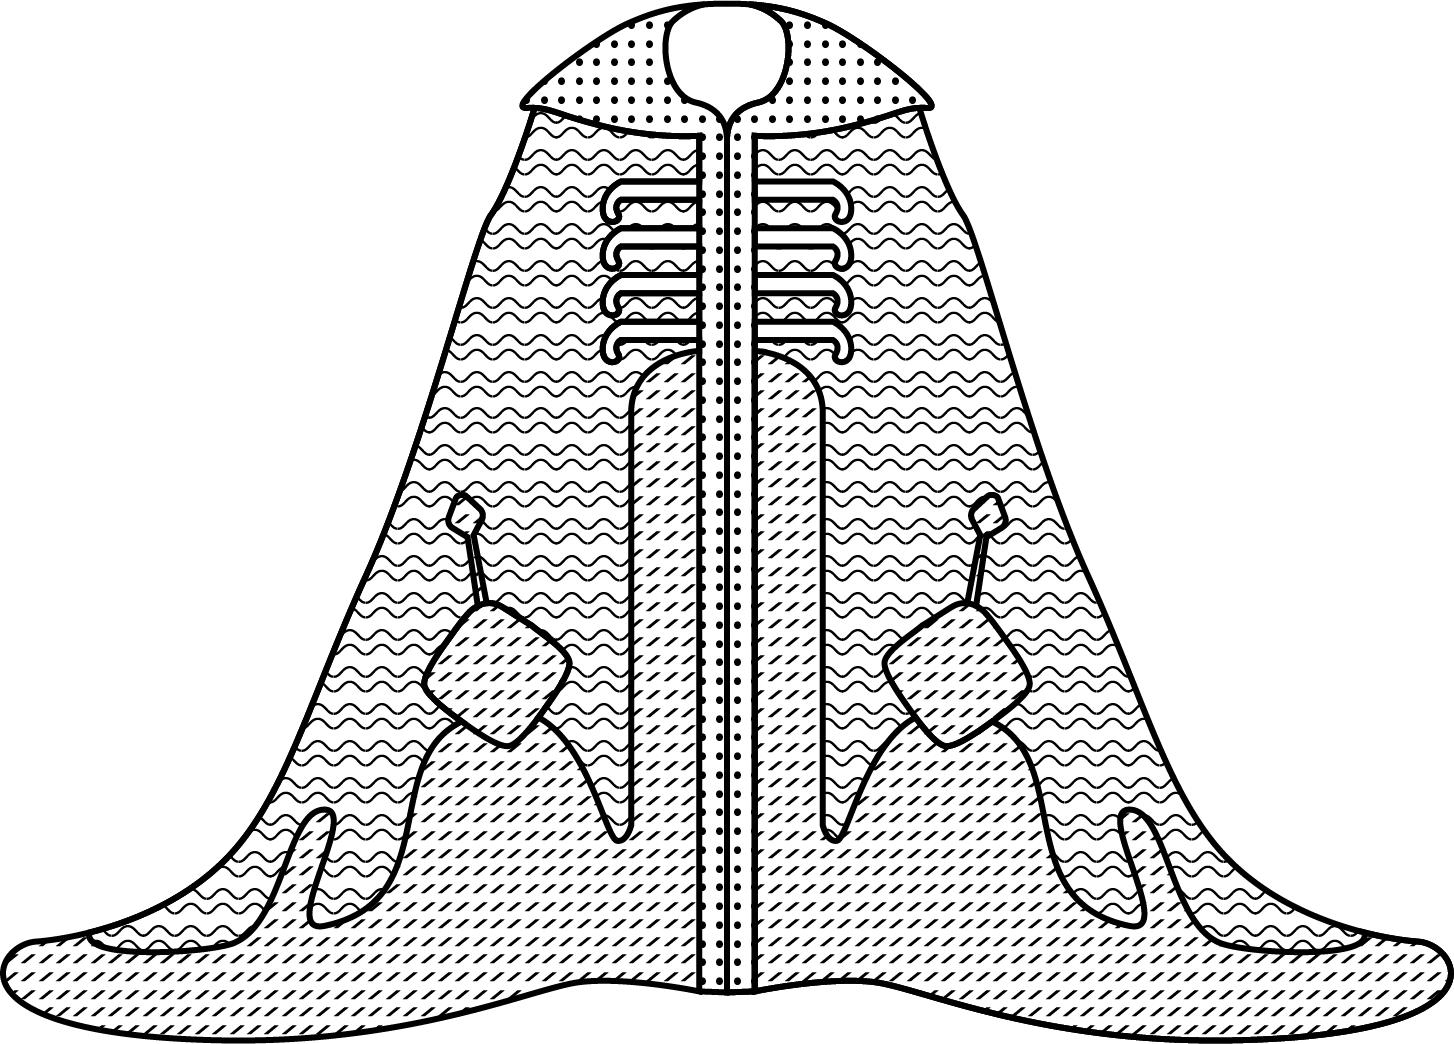 the royal coat